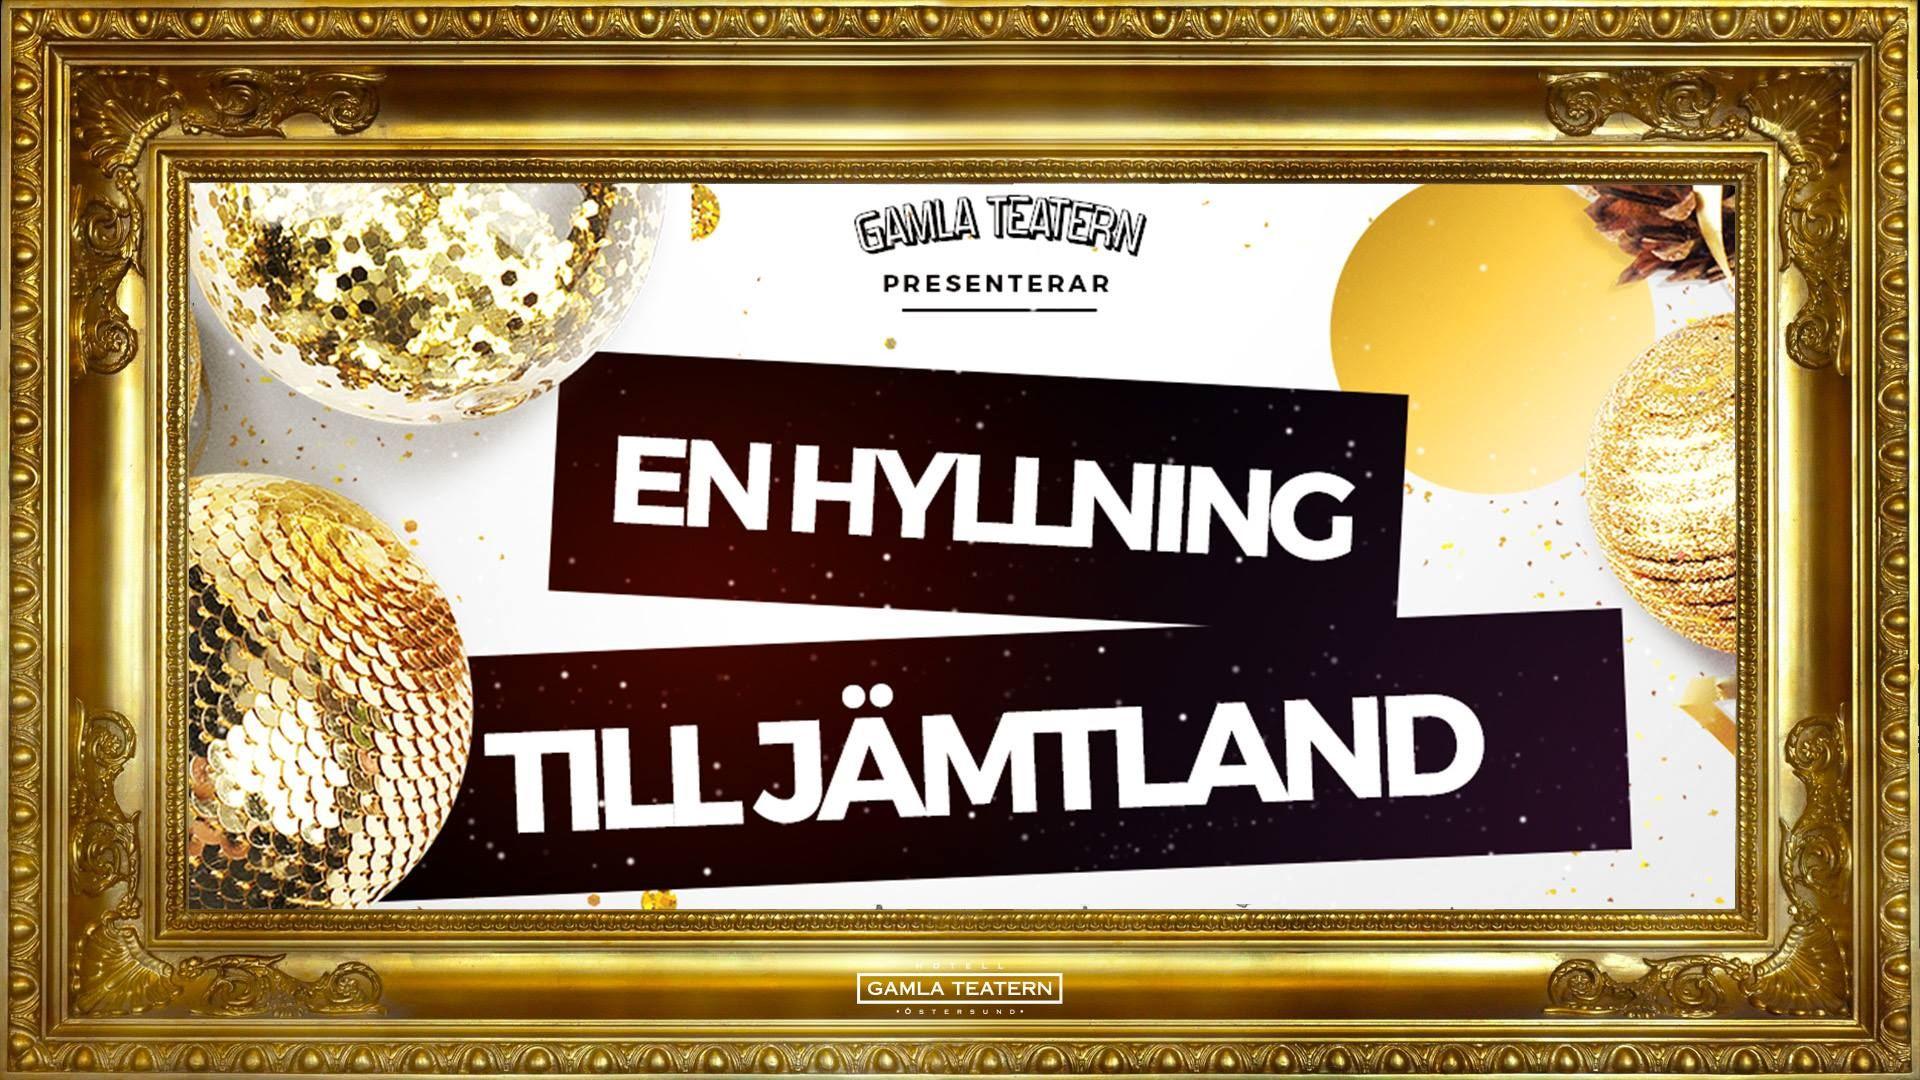 © Gamla teatern, Concert - A tribute to Jämtland